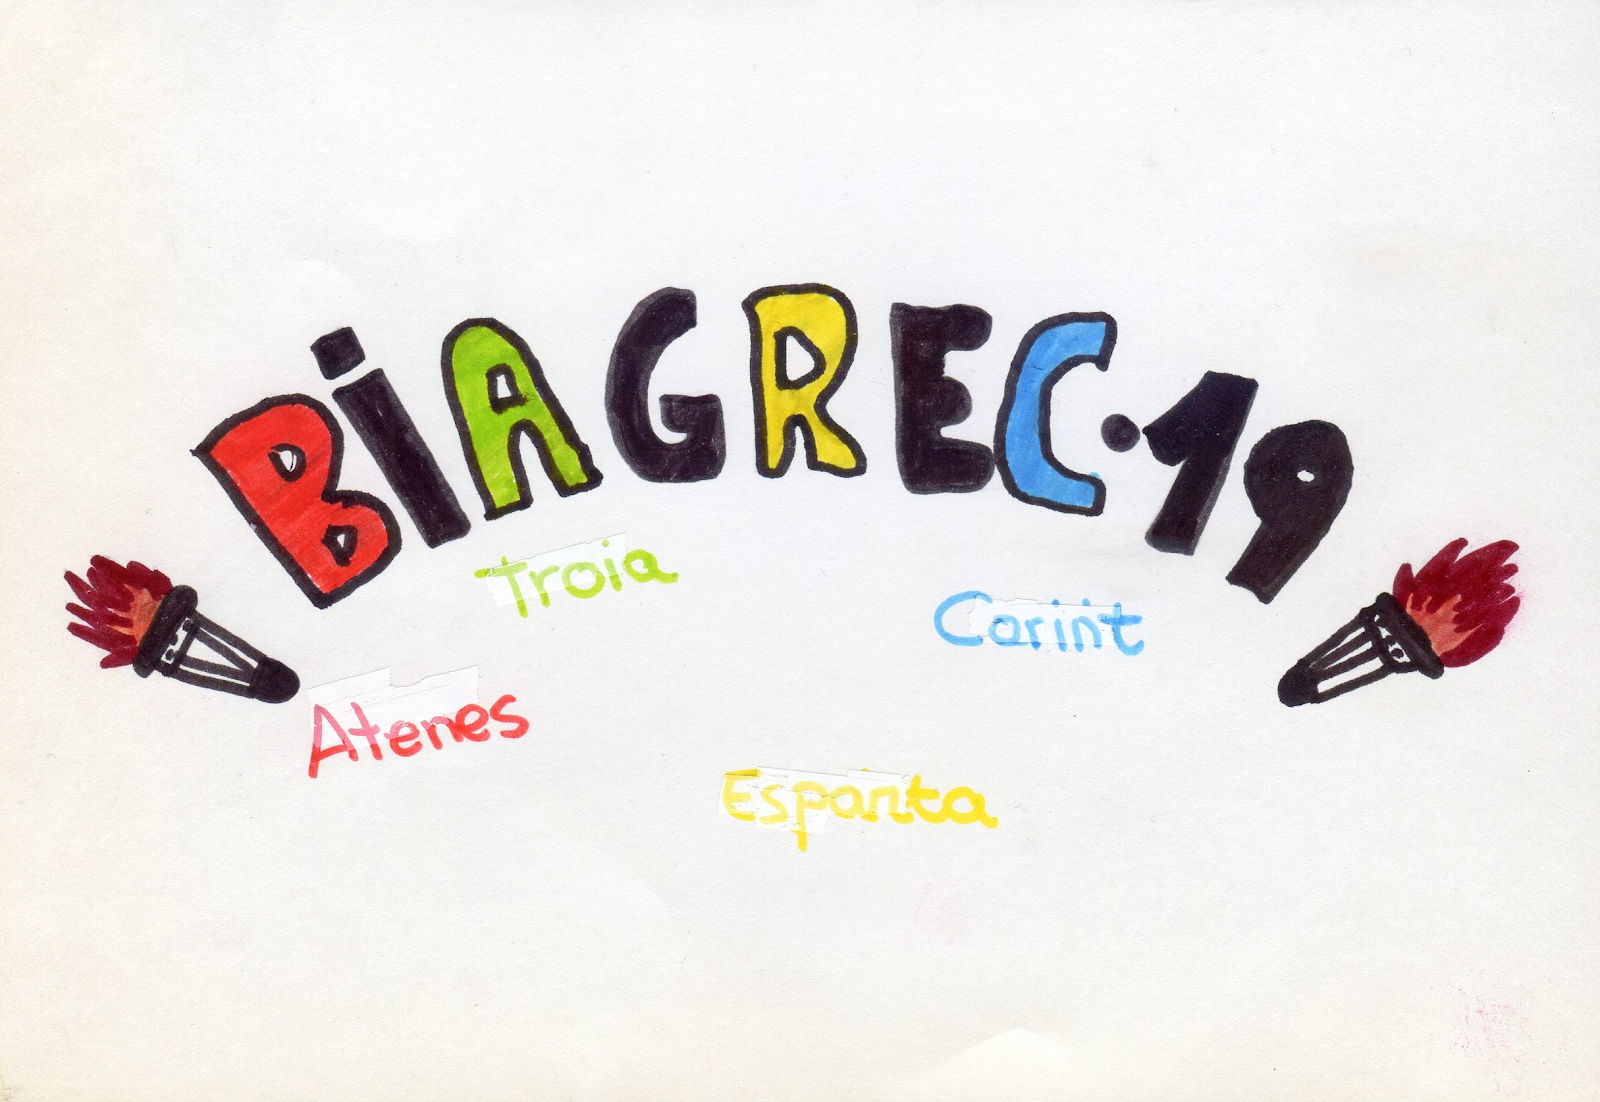 Biagrec - Projecte de síntesi de 1r d'ESO